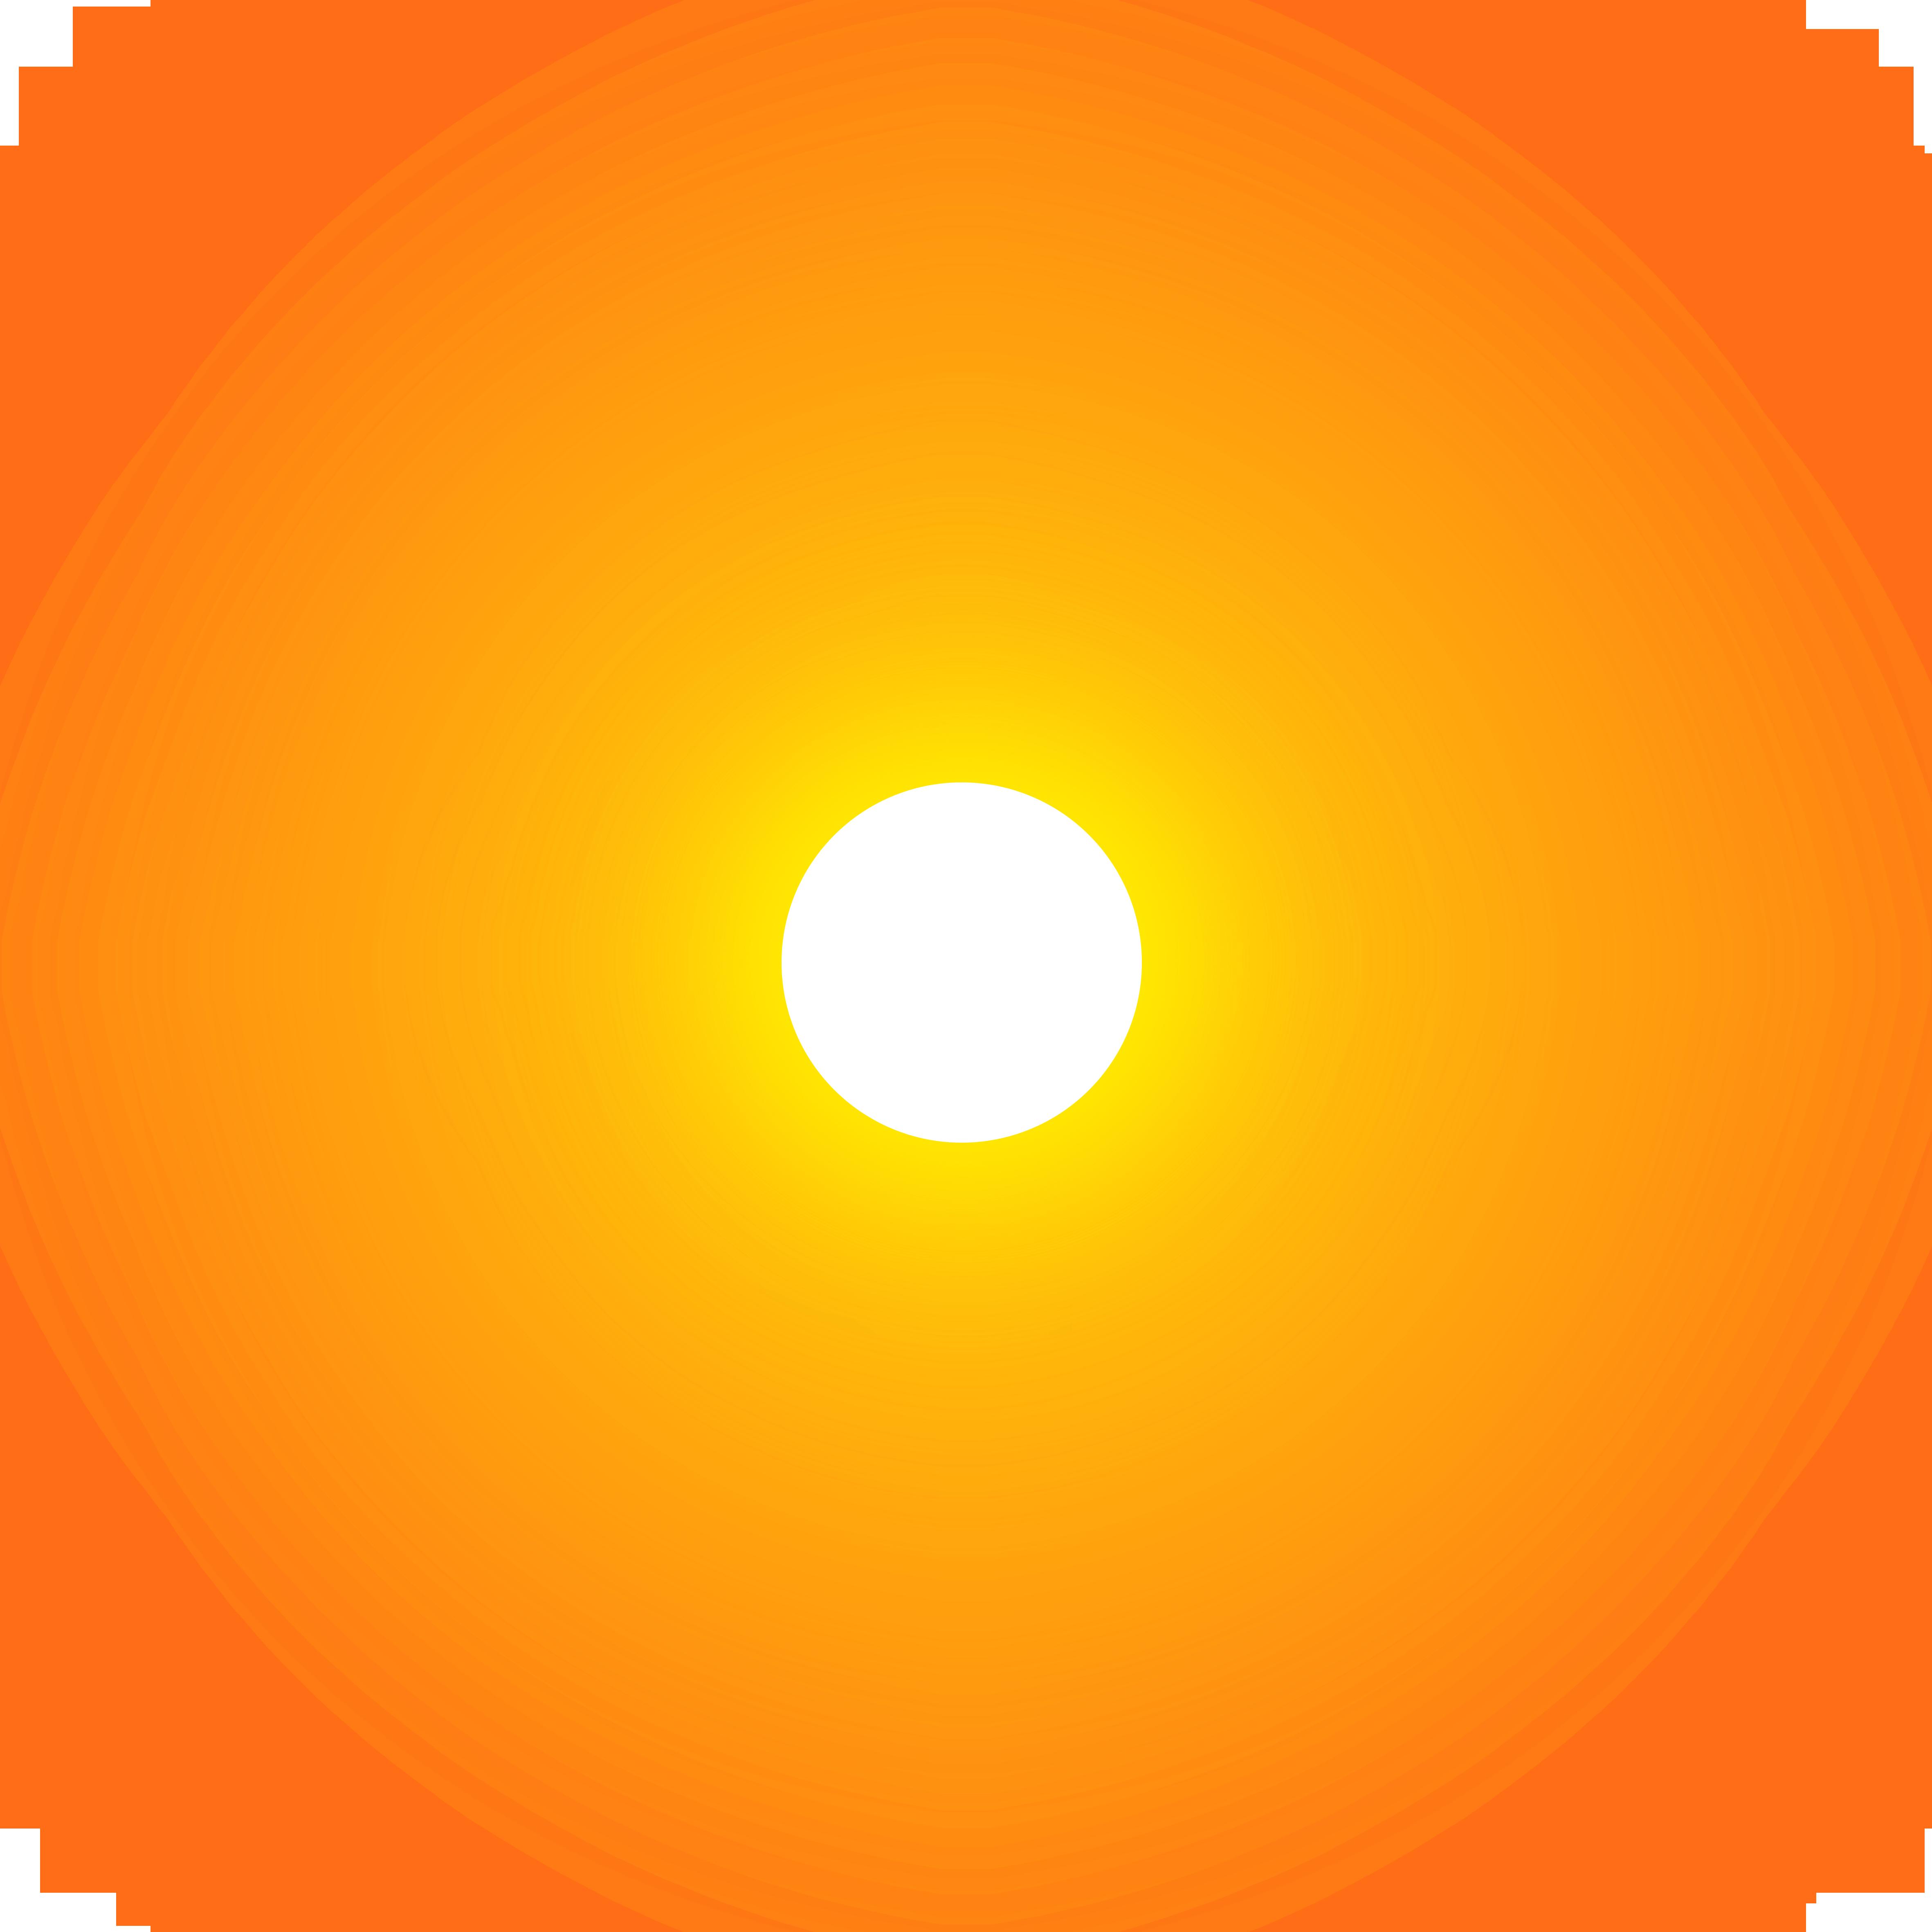 Sunlight PNG HD - 140491